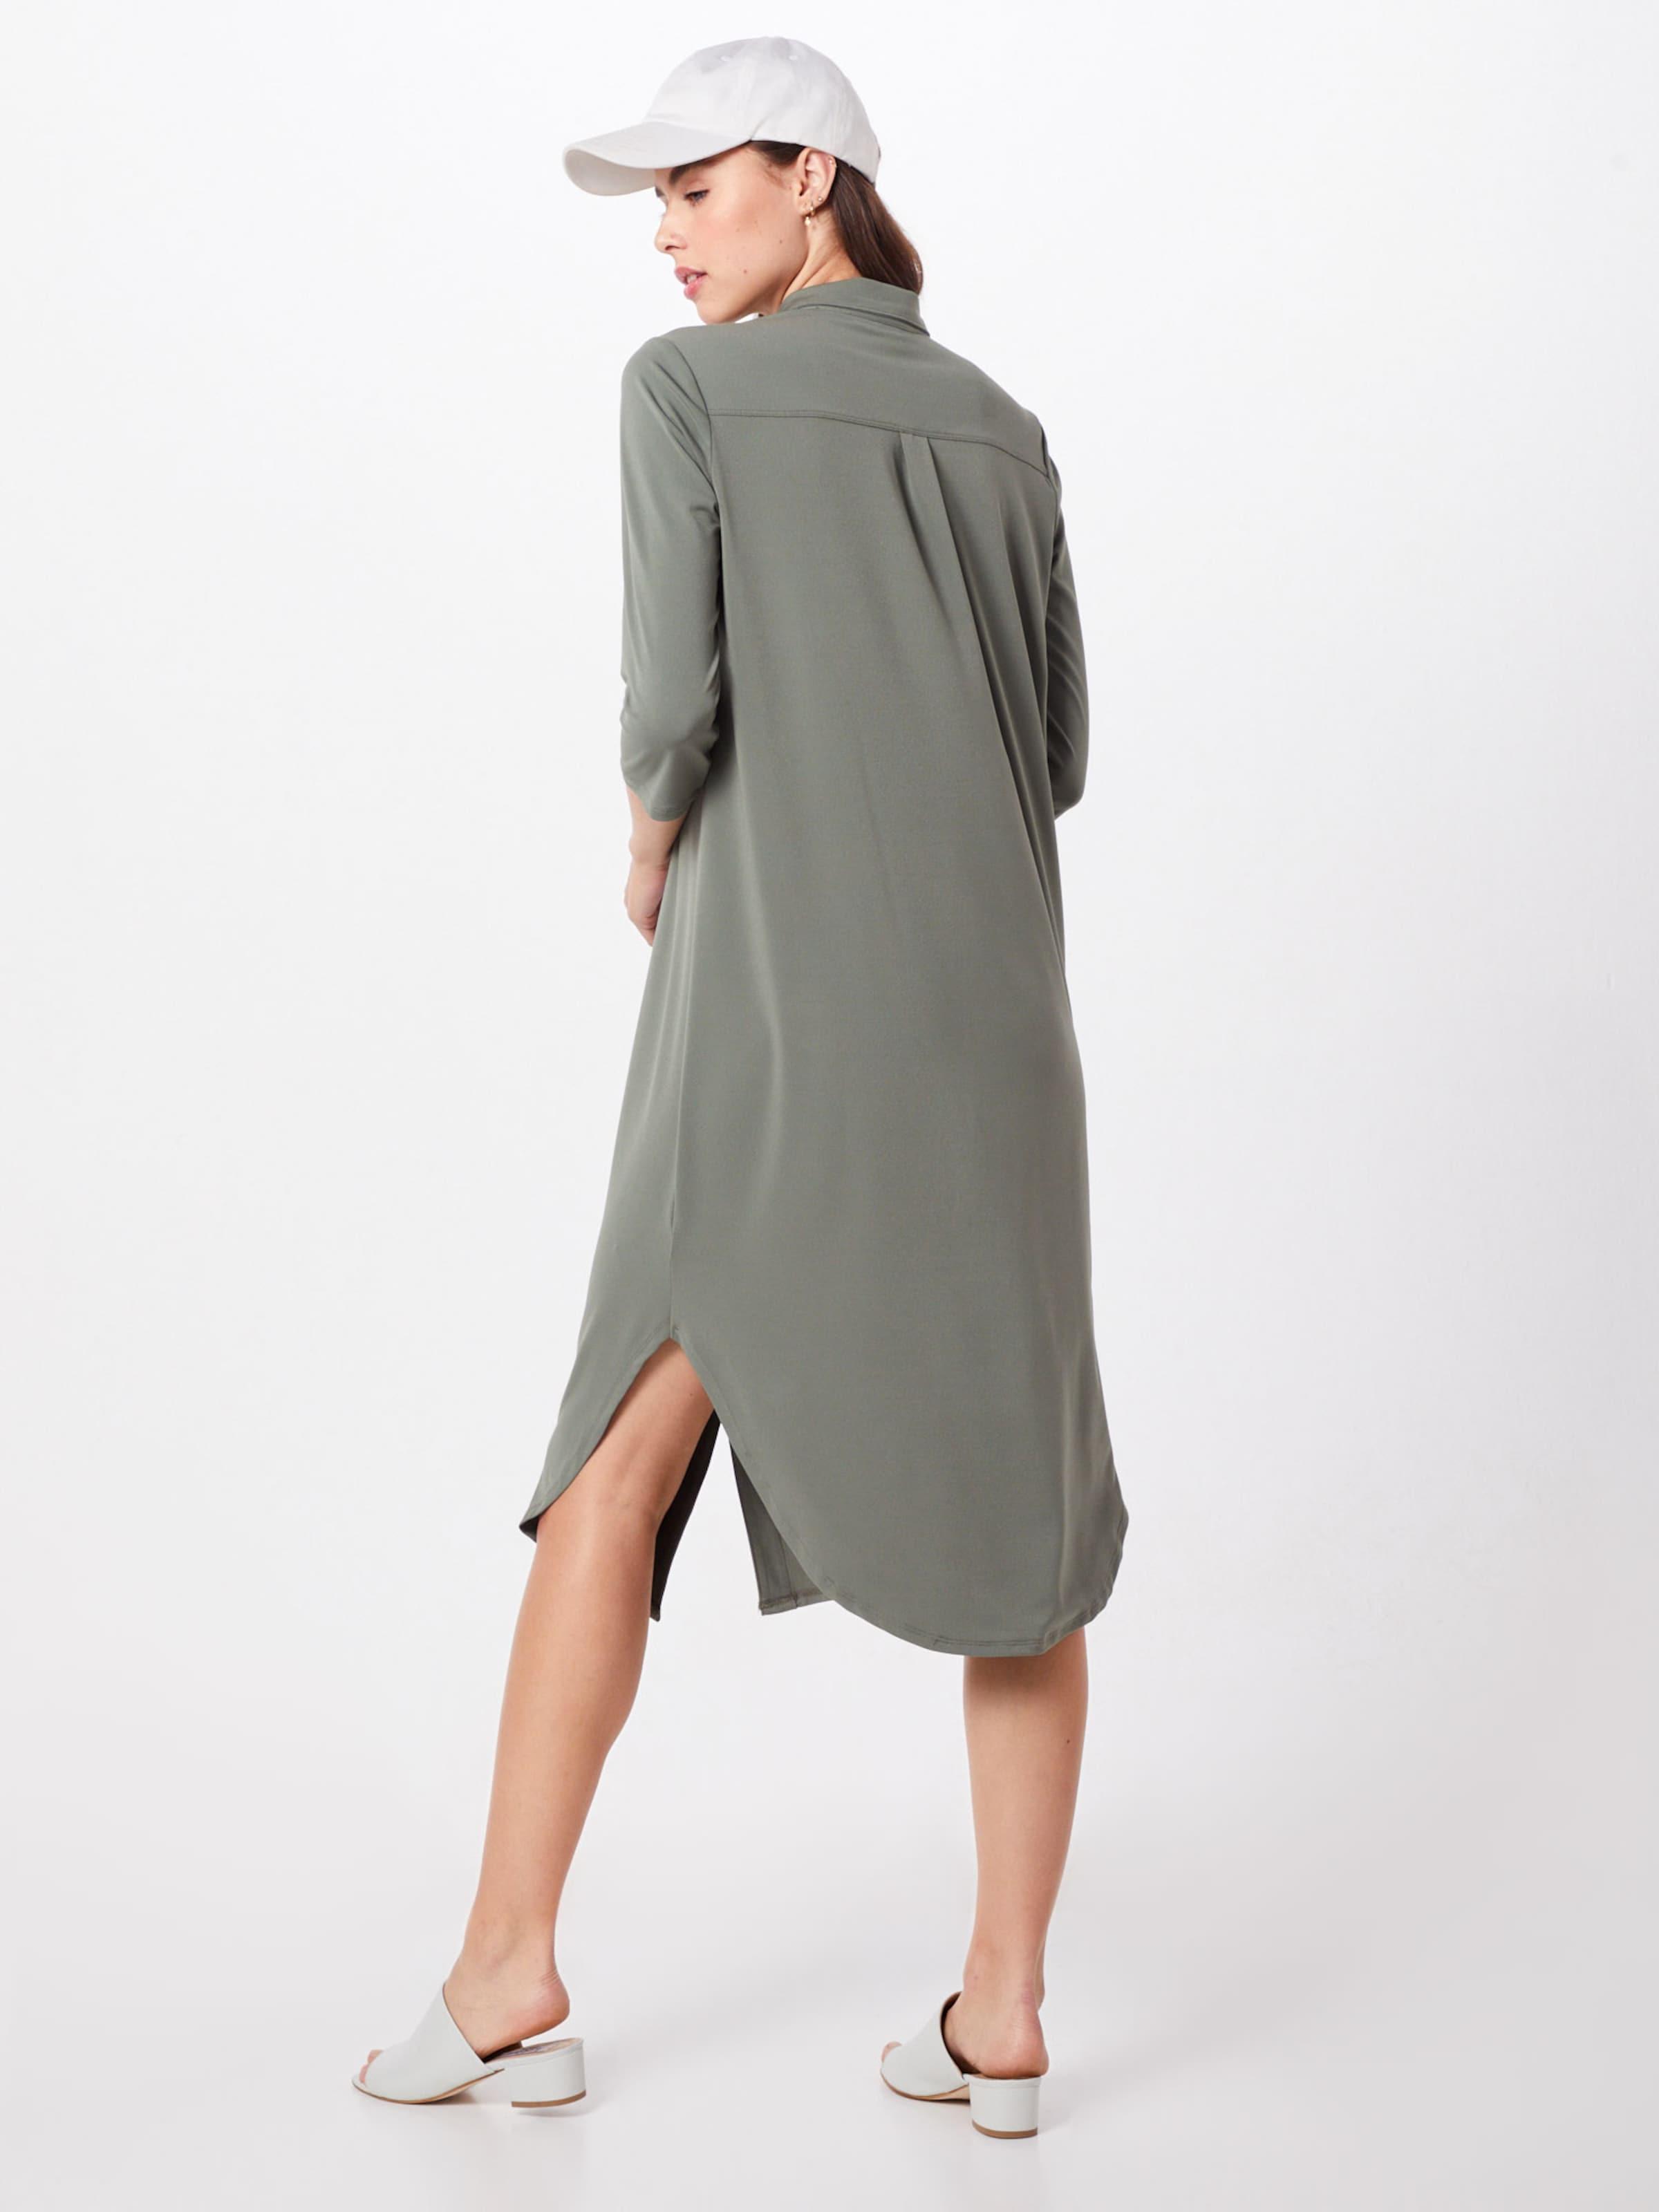 Robe Vert chemise Gap 'lsshirtdress' Clair En c35qSL4ARj